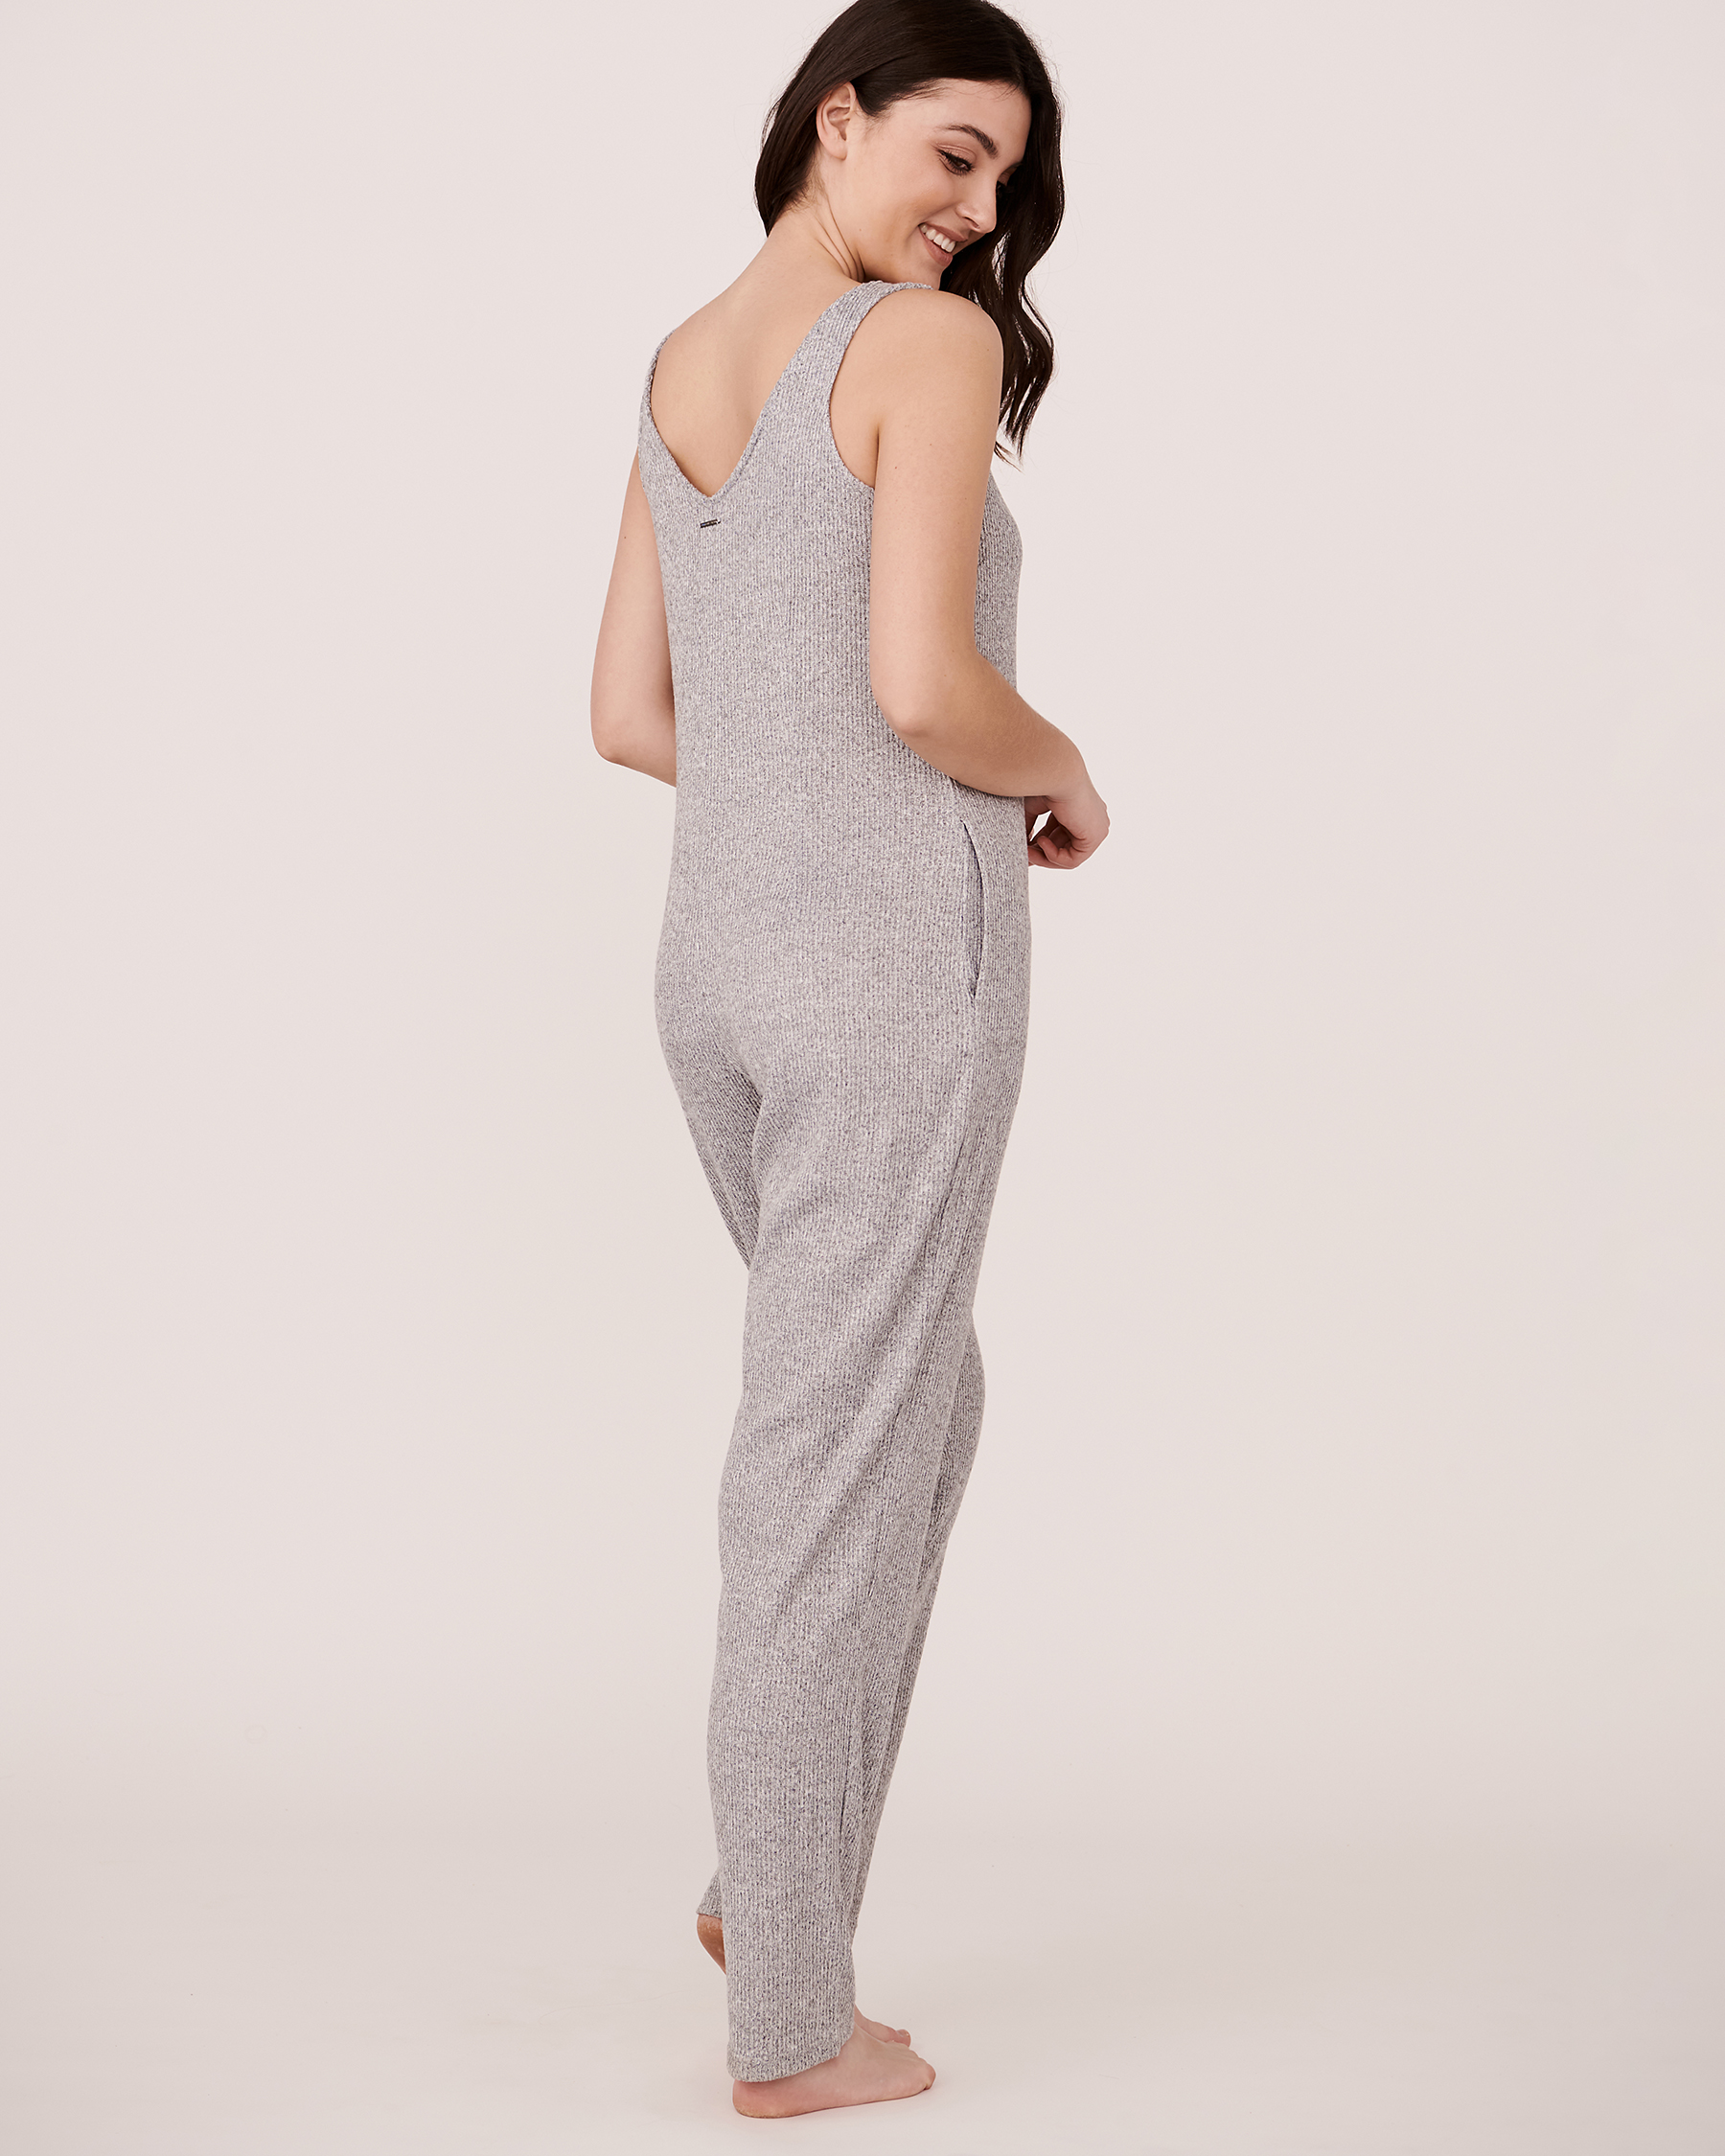 LA VIE EN ROSE Ribbed V-Neckline Jumpsuit Grey 774-474-2-04 - View3